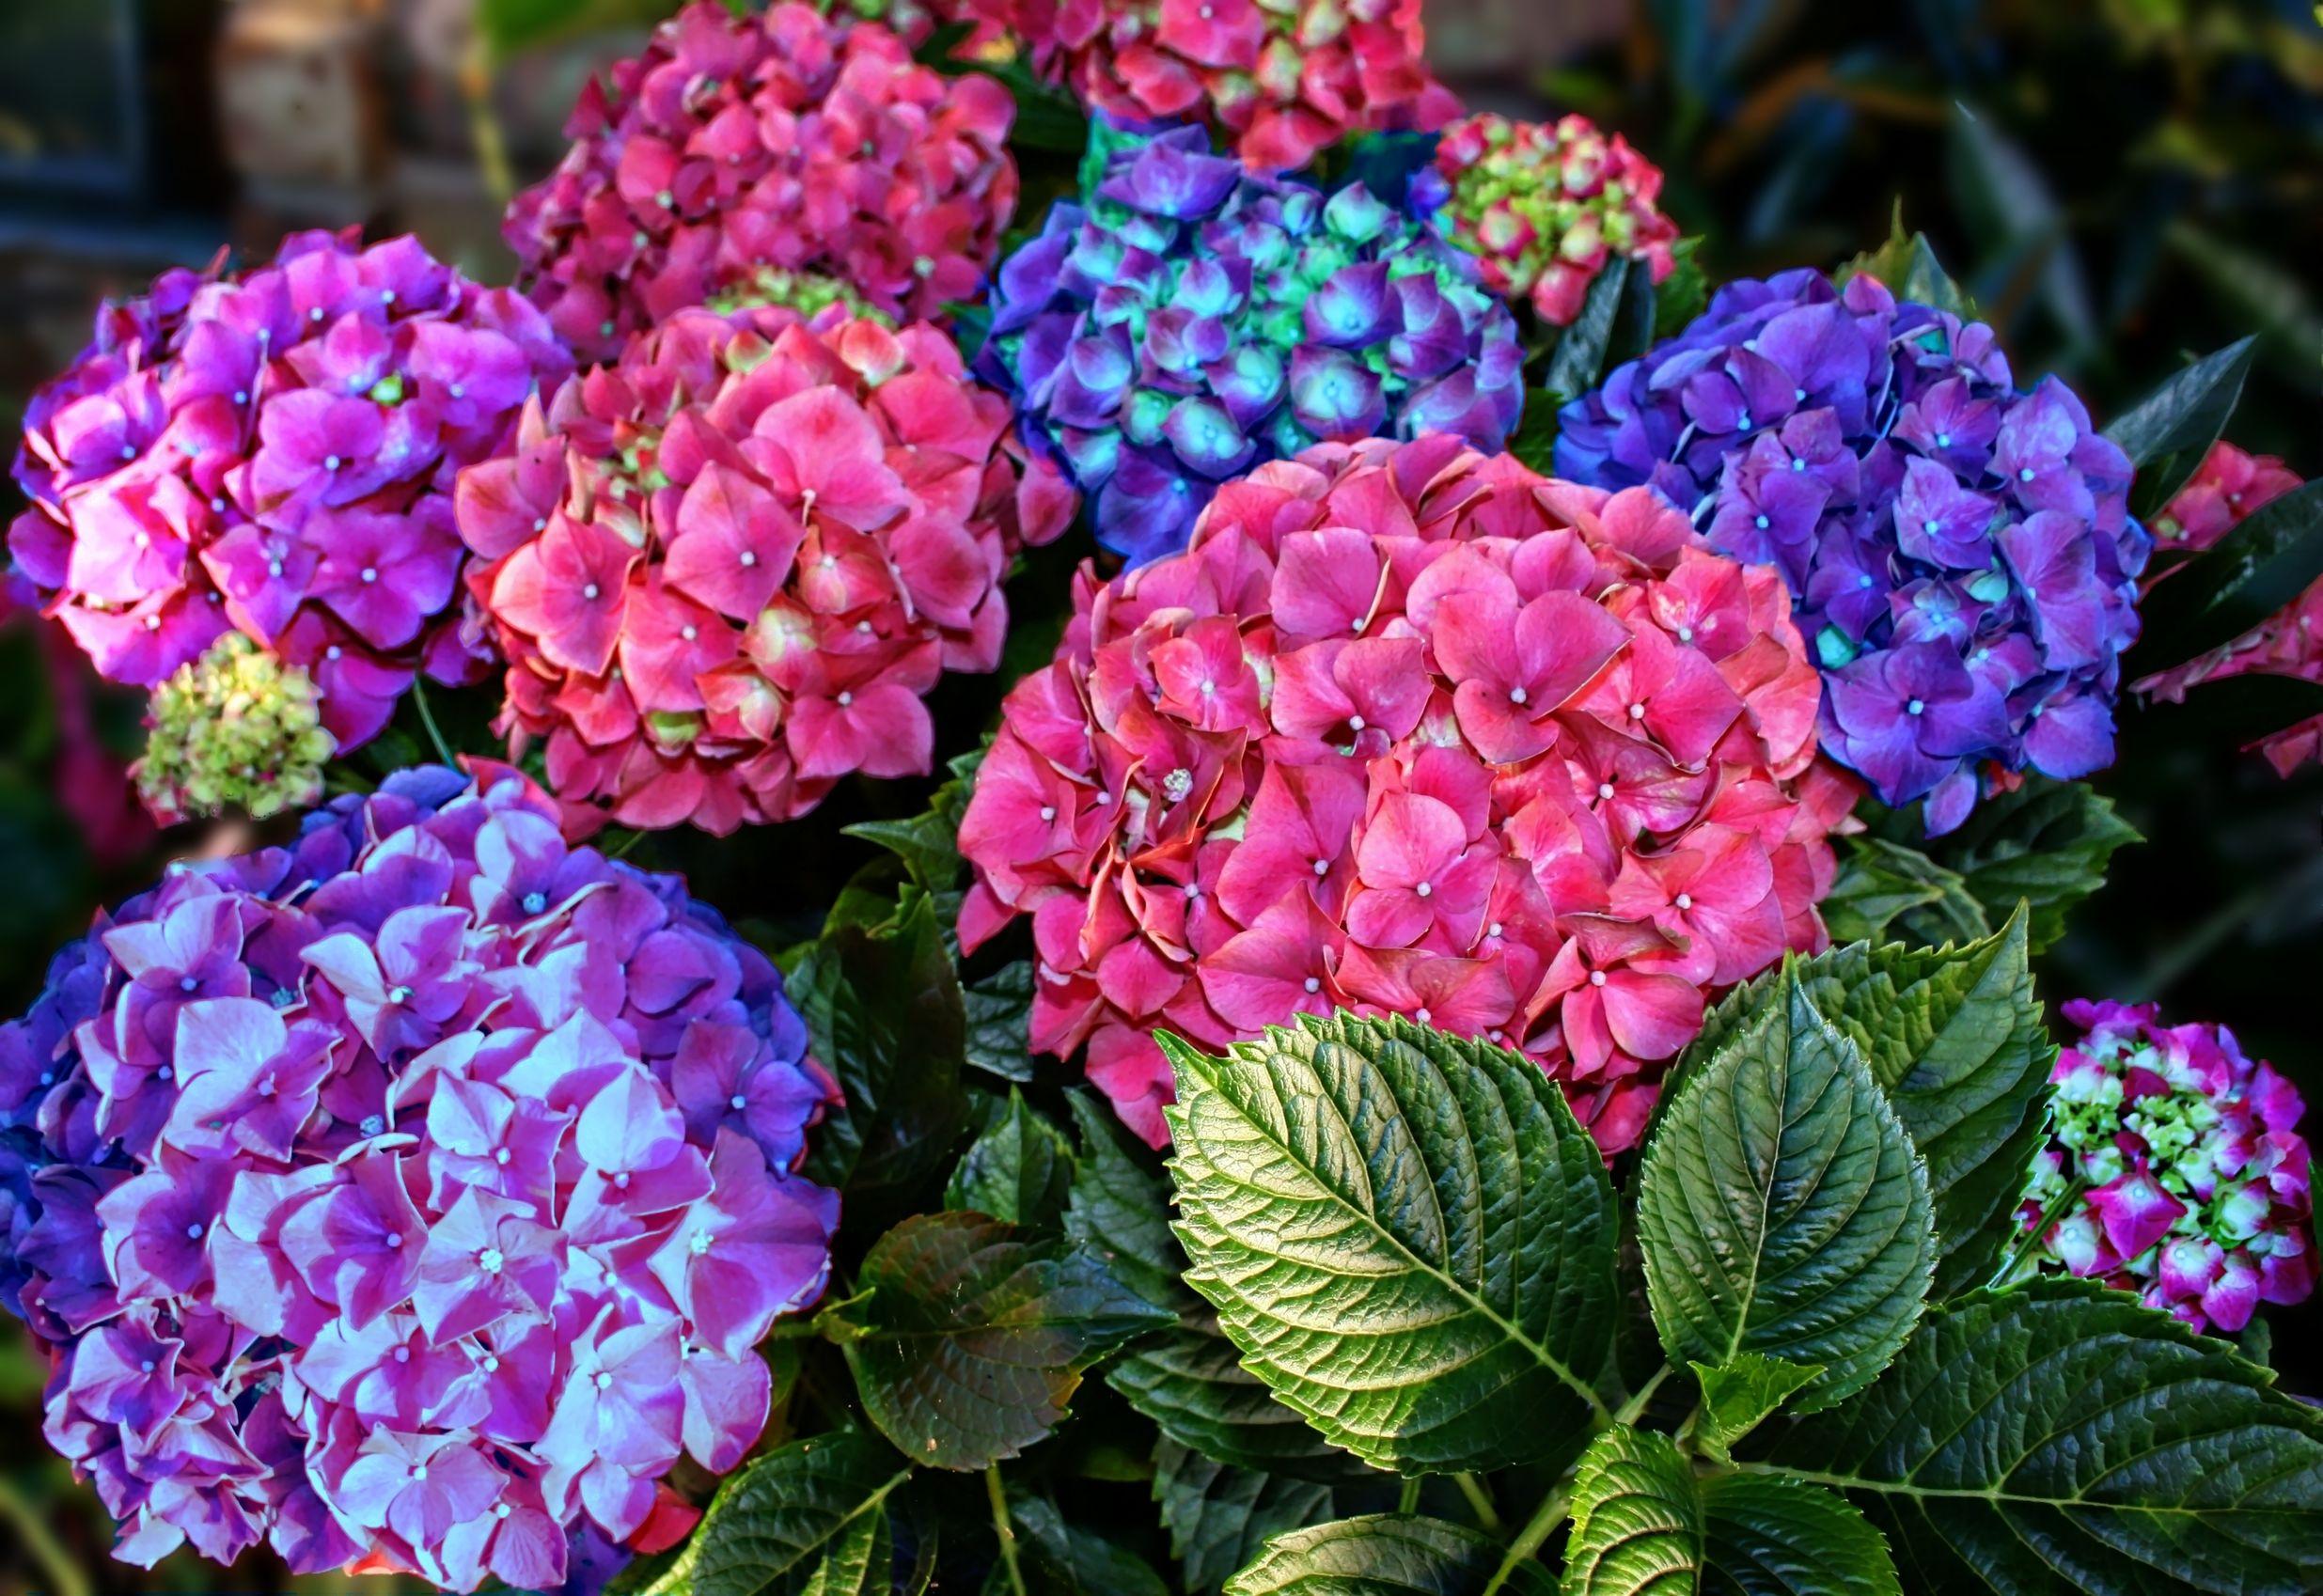 All4Women | How to grow hydrangeas (AKA Christmas roses